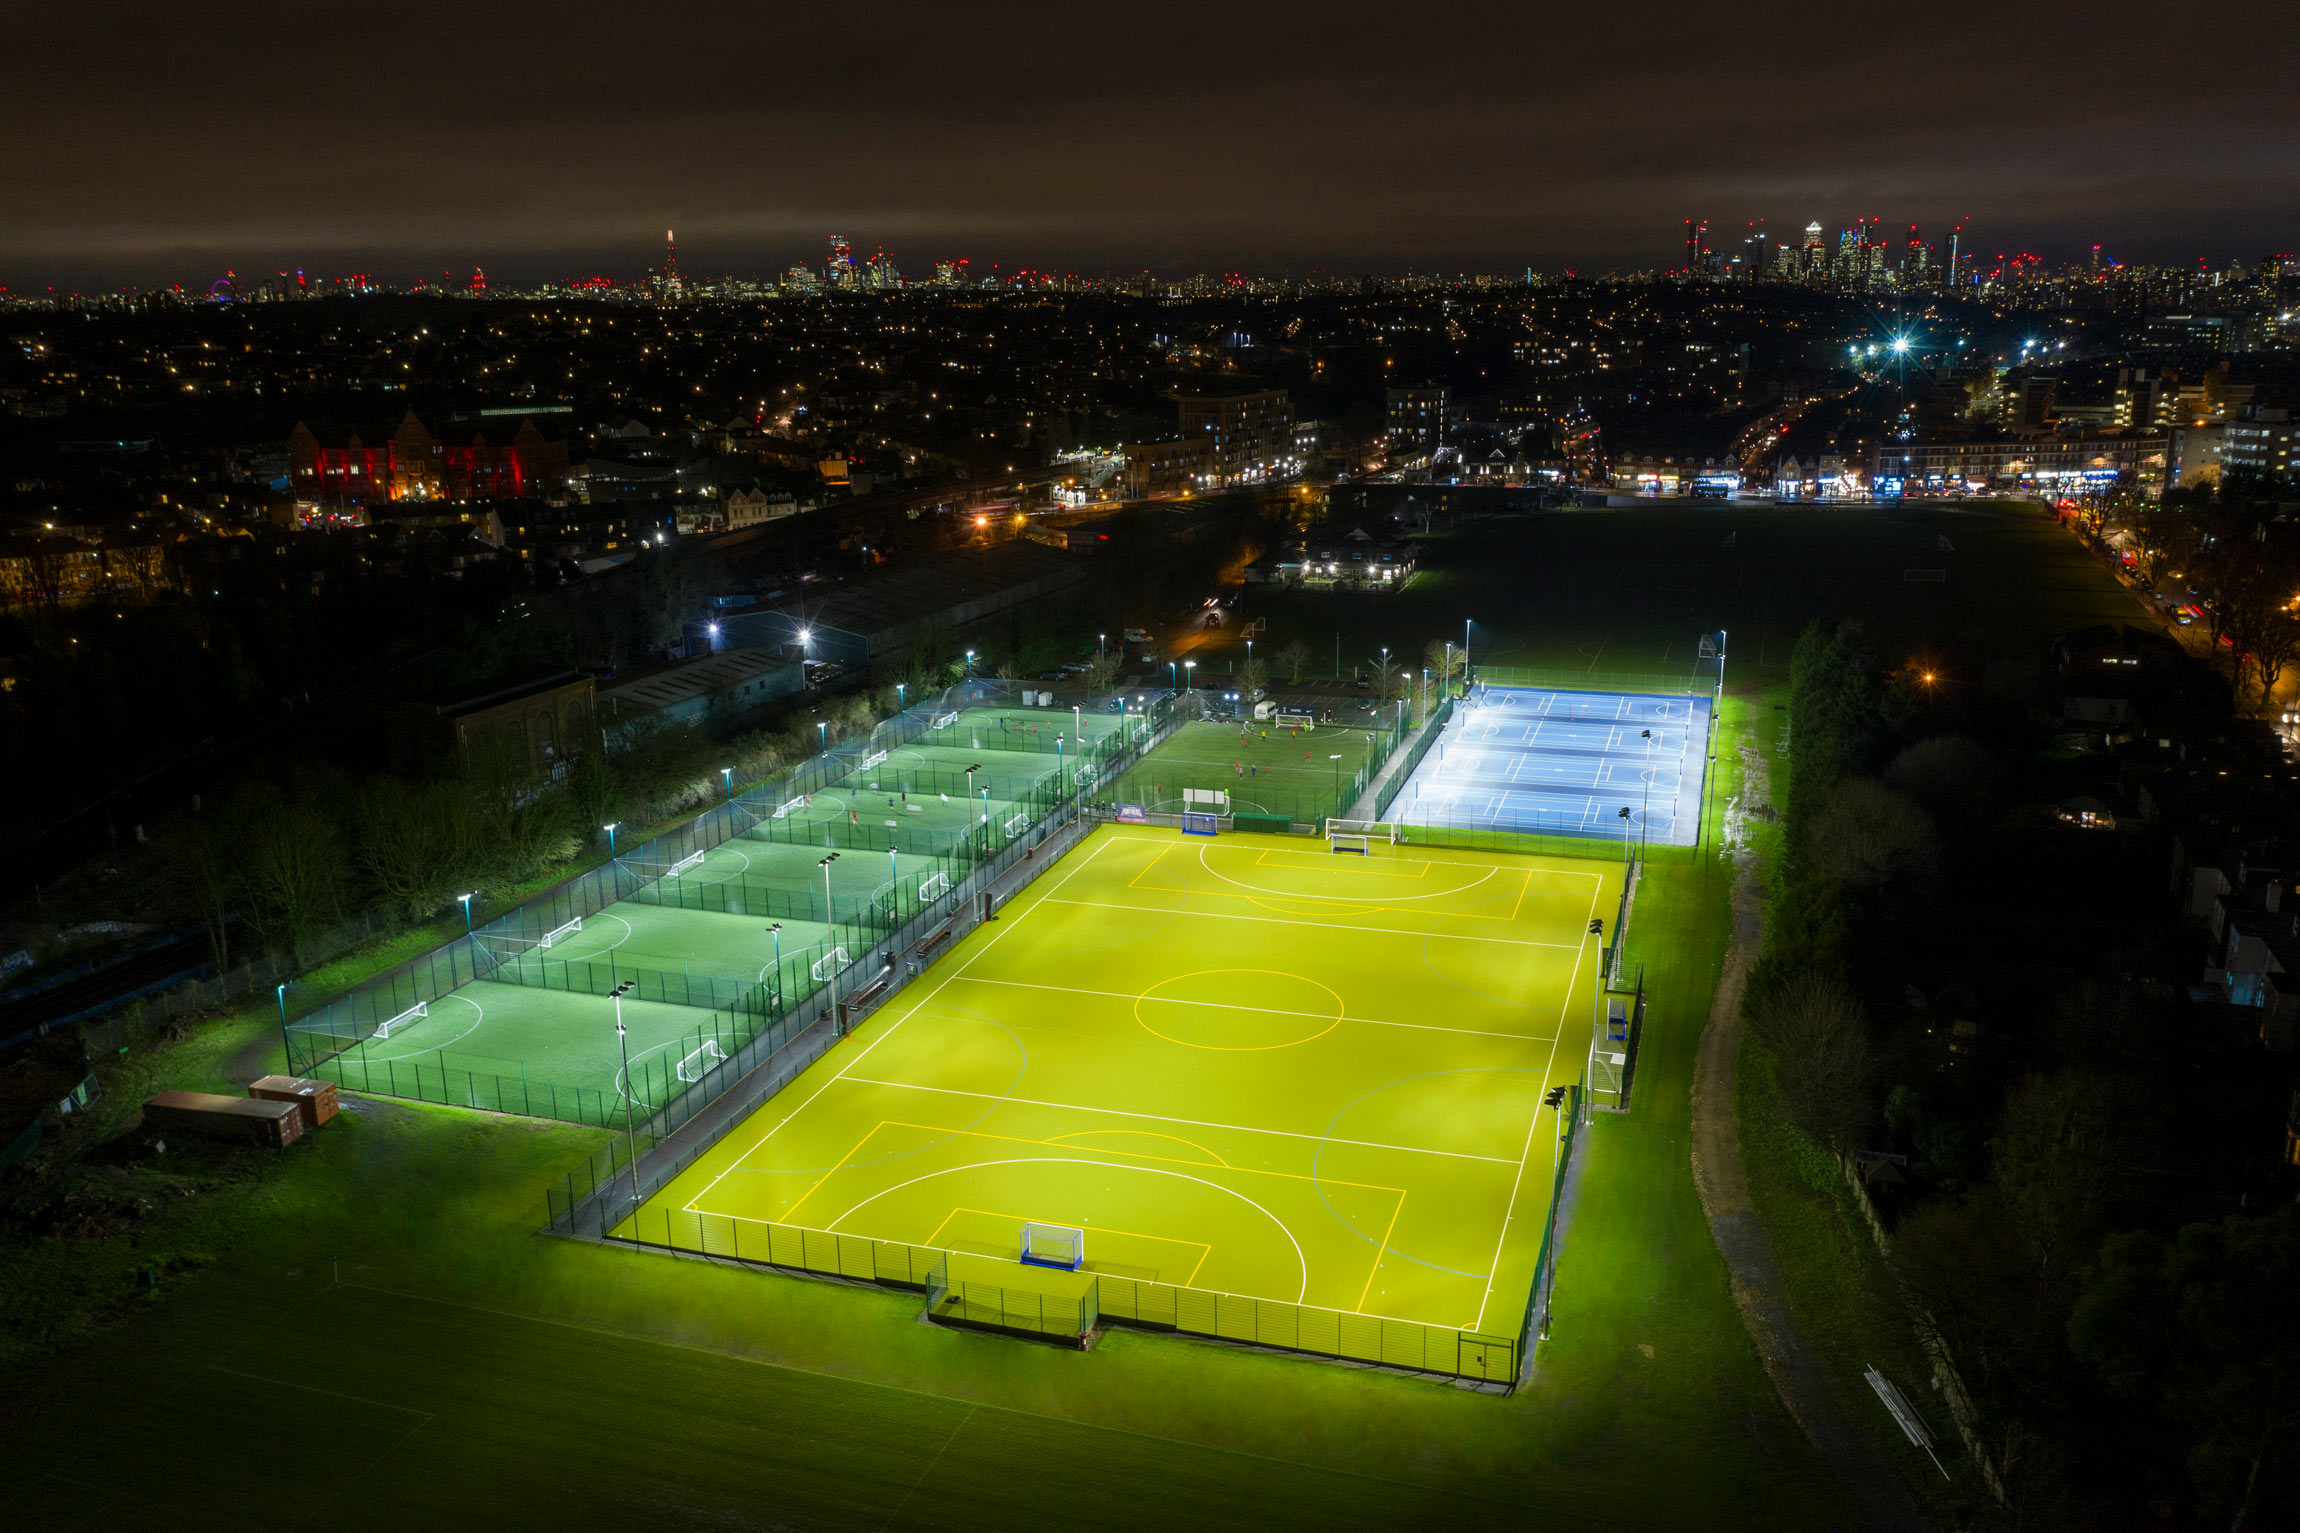 St Dunstan's Sports Facilities Open